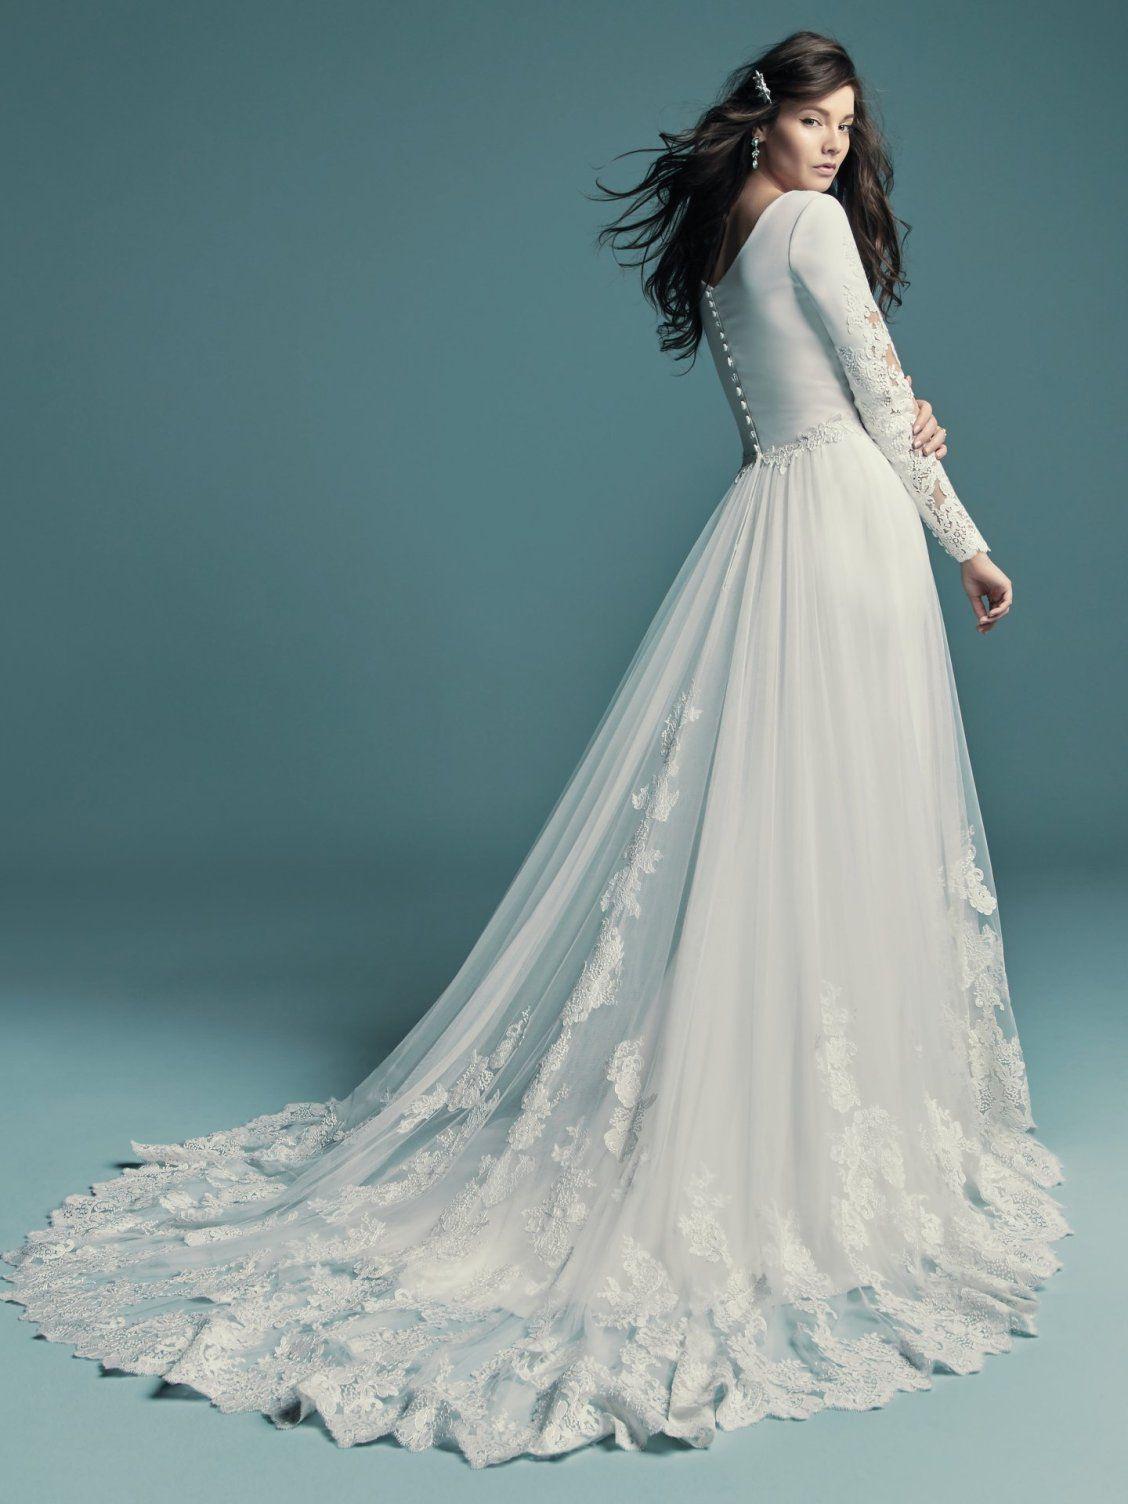 Maggie Sottero Wedding Dresses | Bateau neckline, Maggie sottero and ...